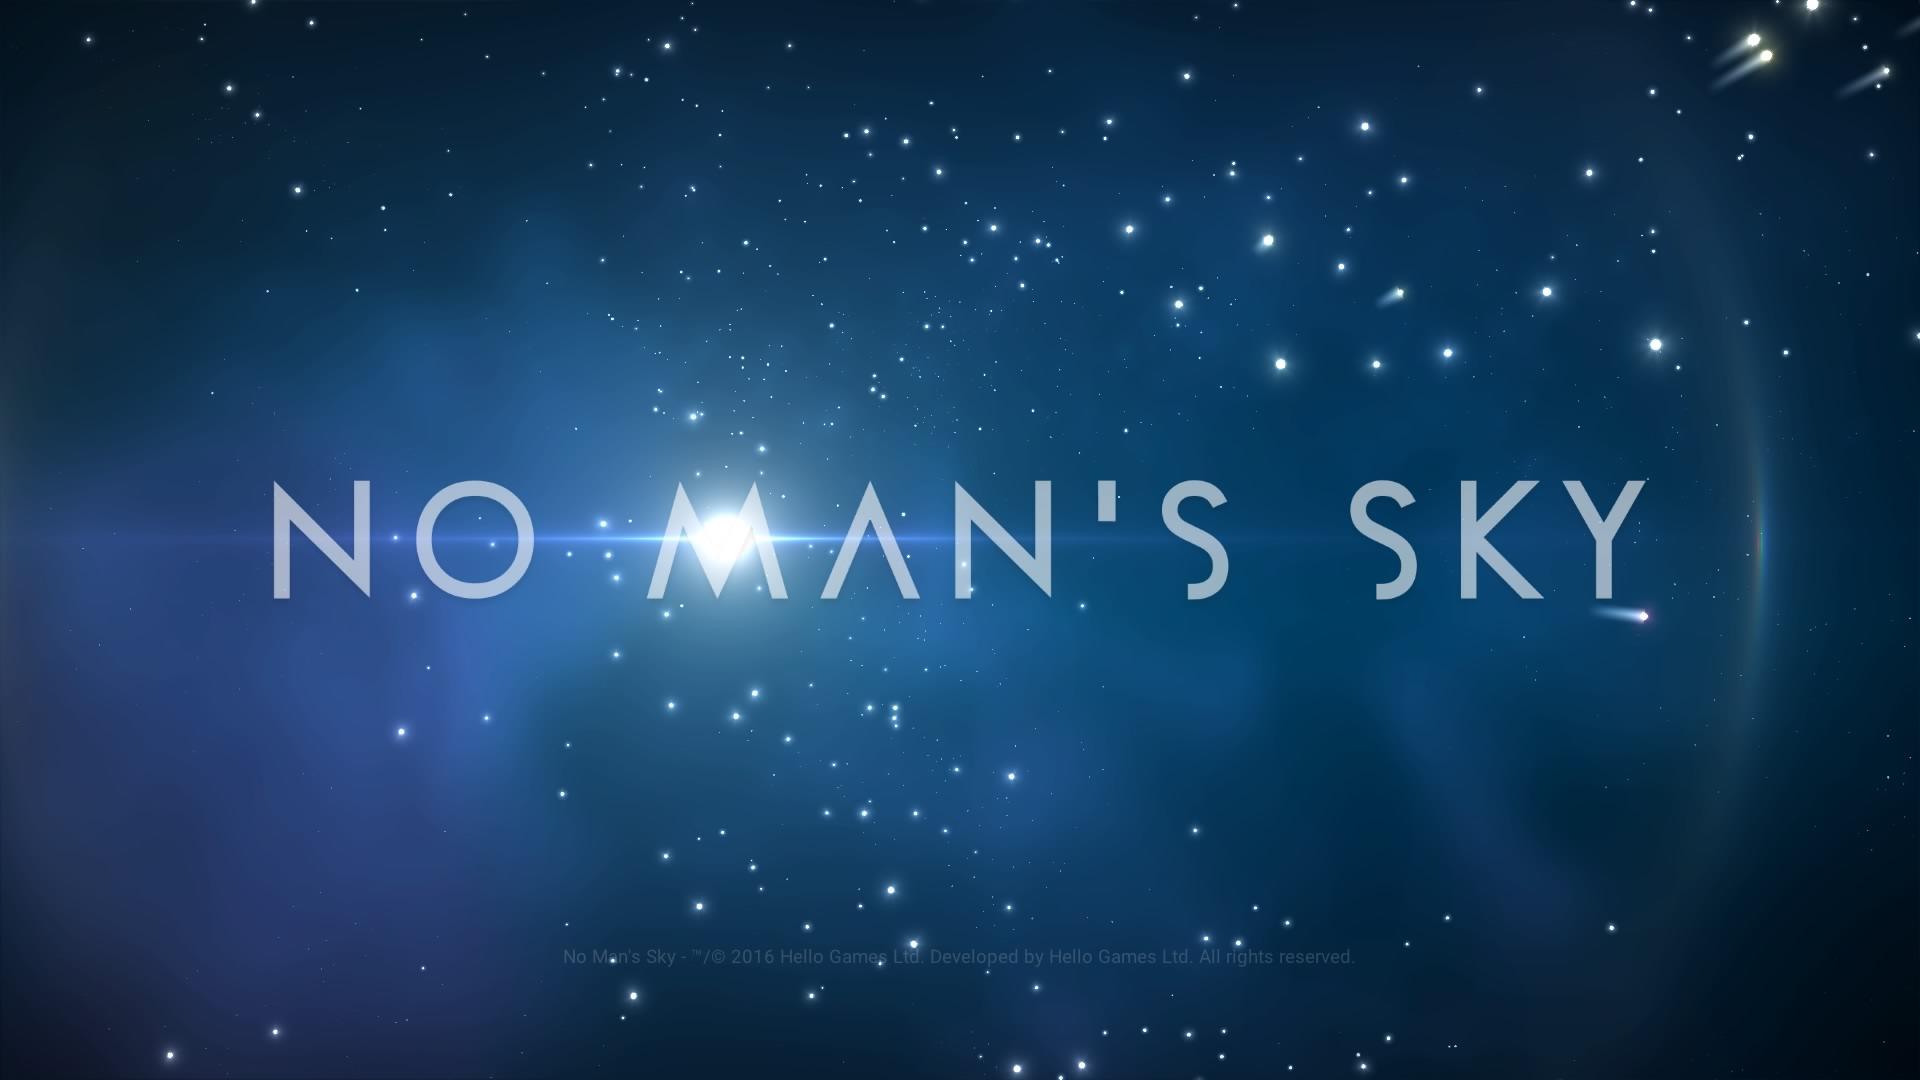 nomansky/no_mans_sky_20160820105955.png